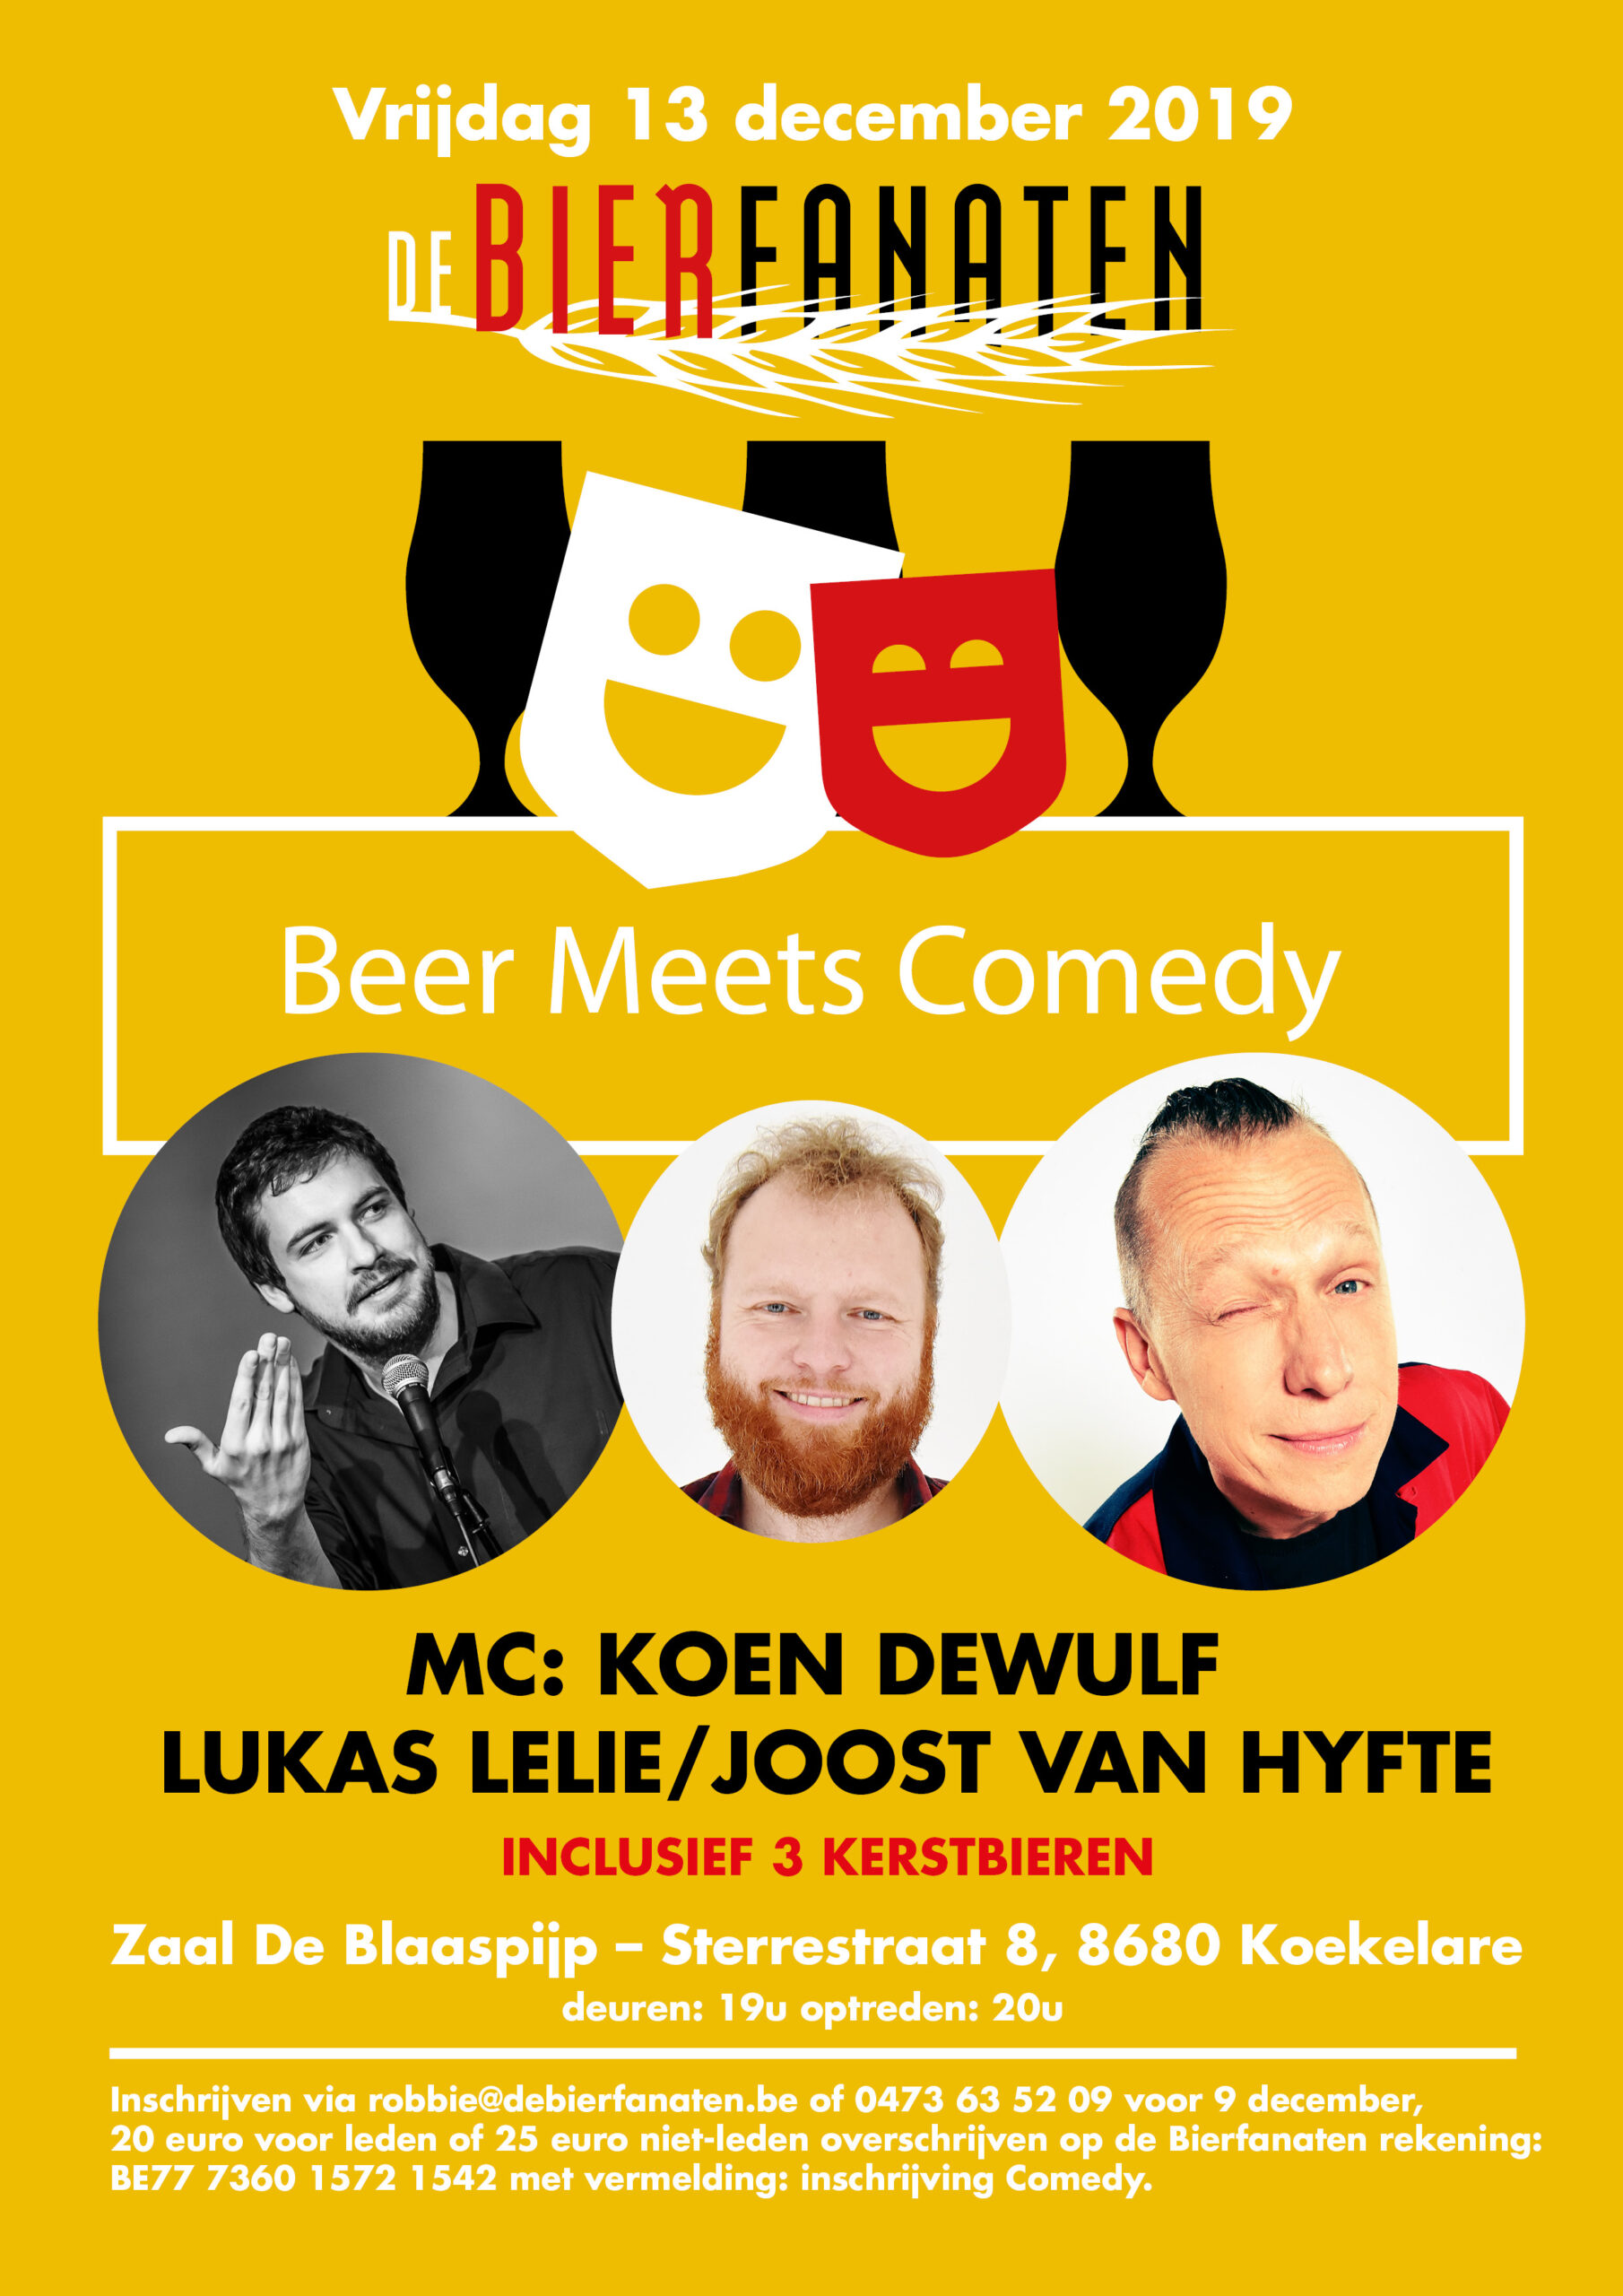 BeerMeetsComedy4b